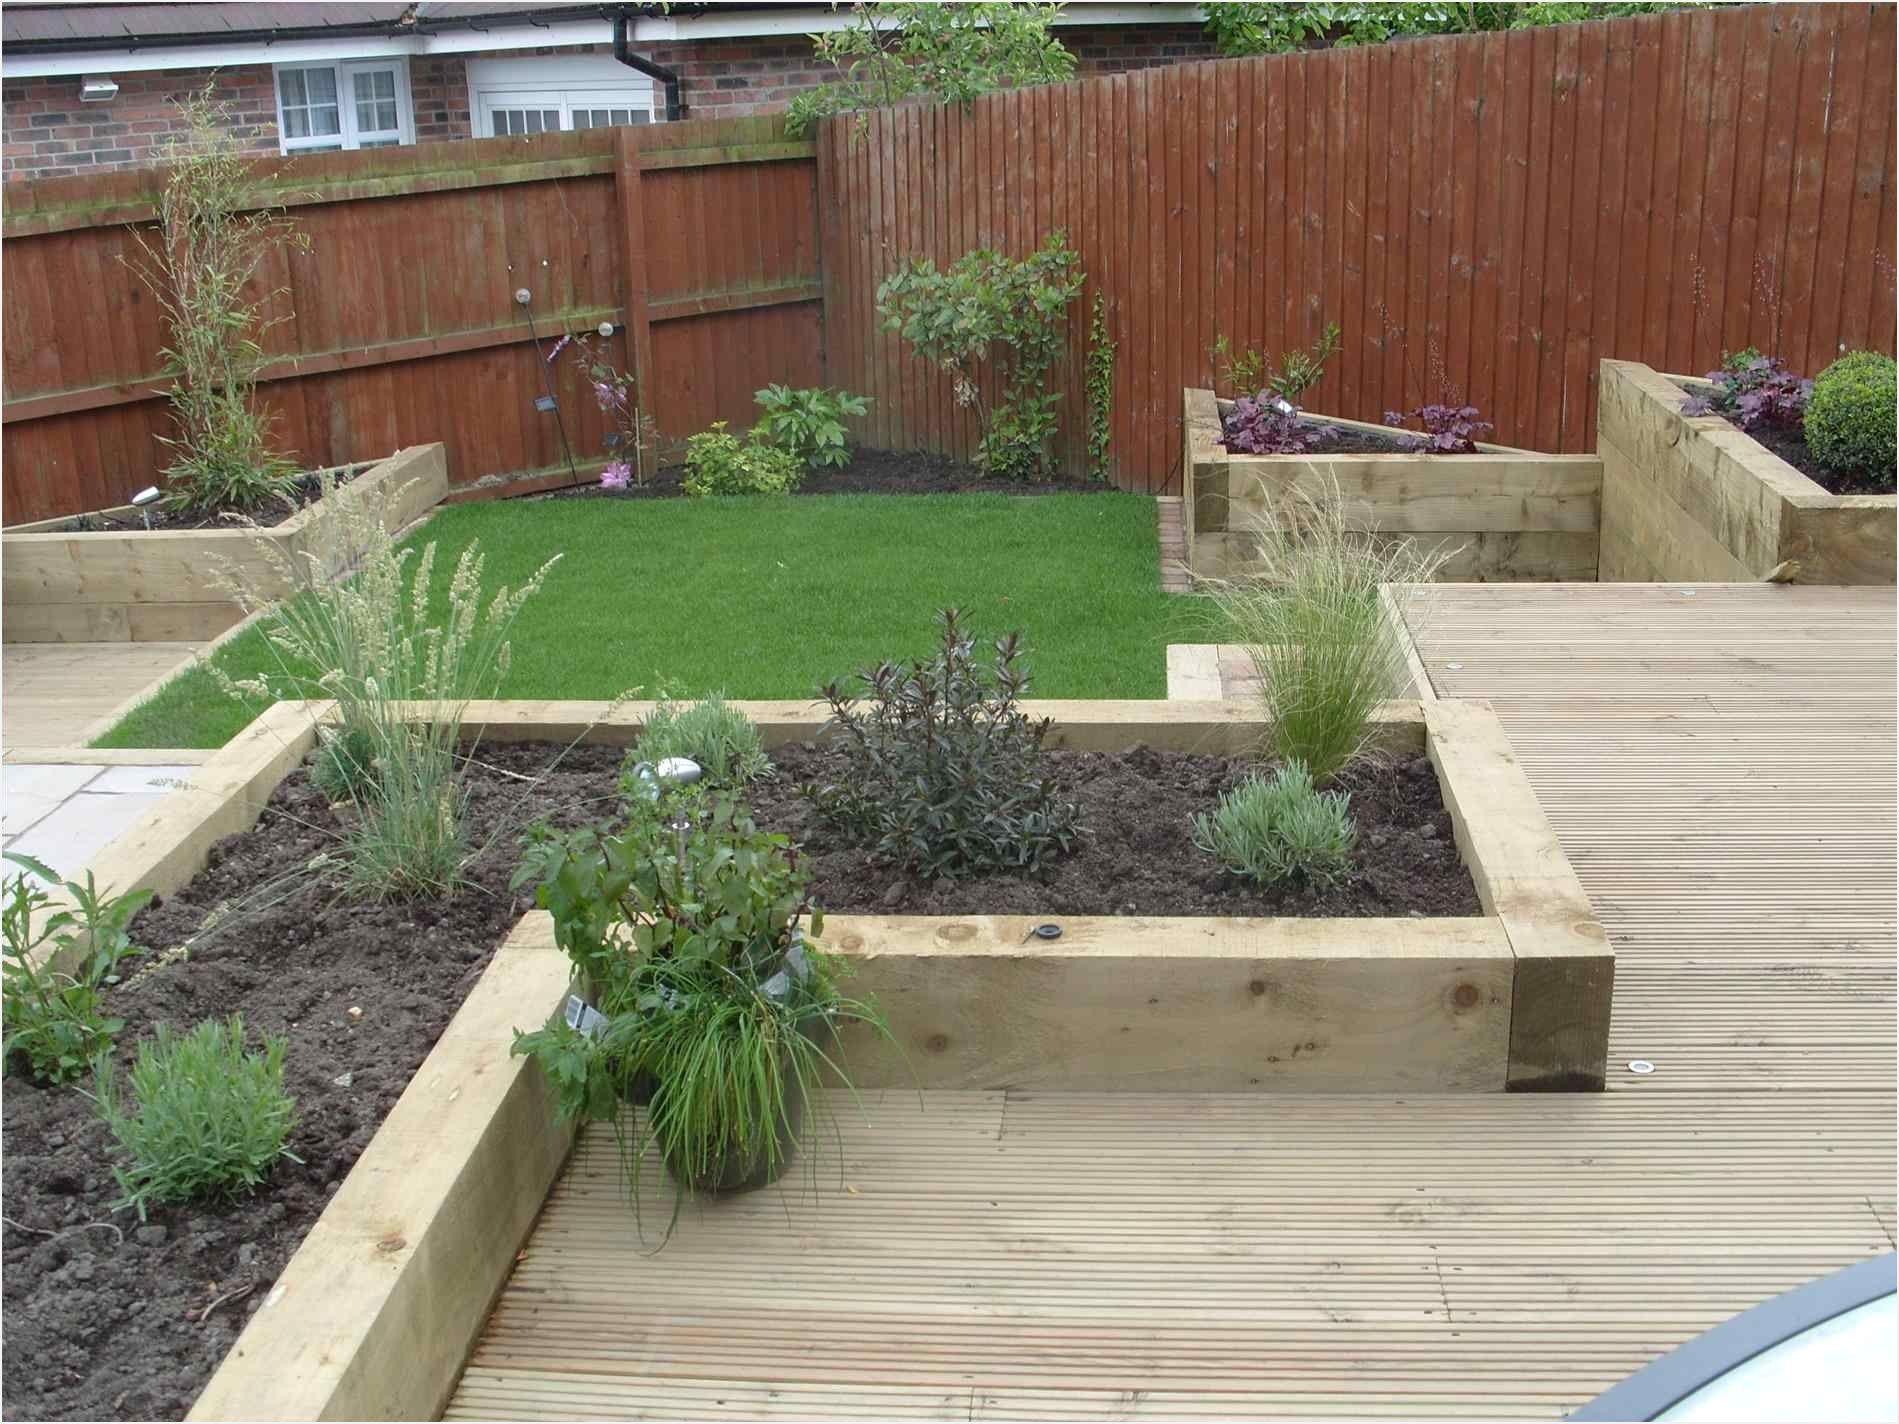 40 Perfect Backyard Landscape Ideas without Grass 77 No ...